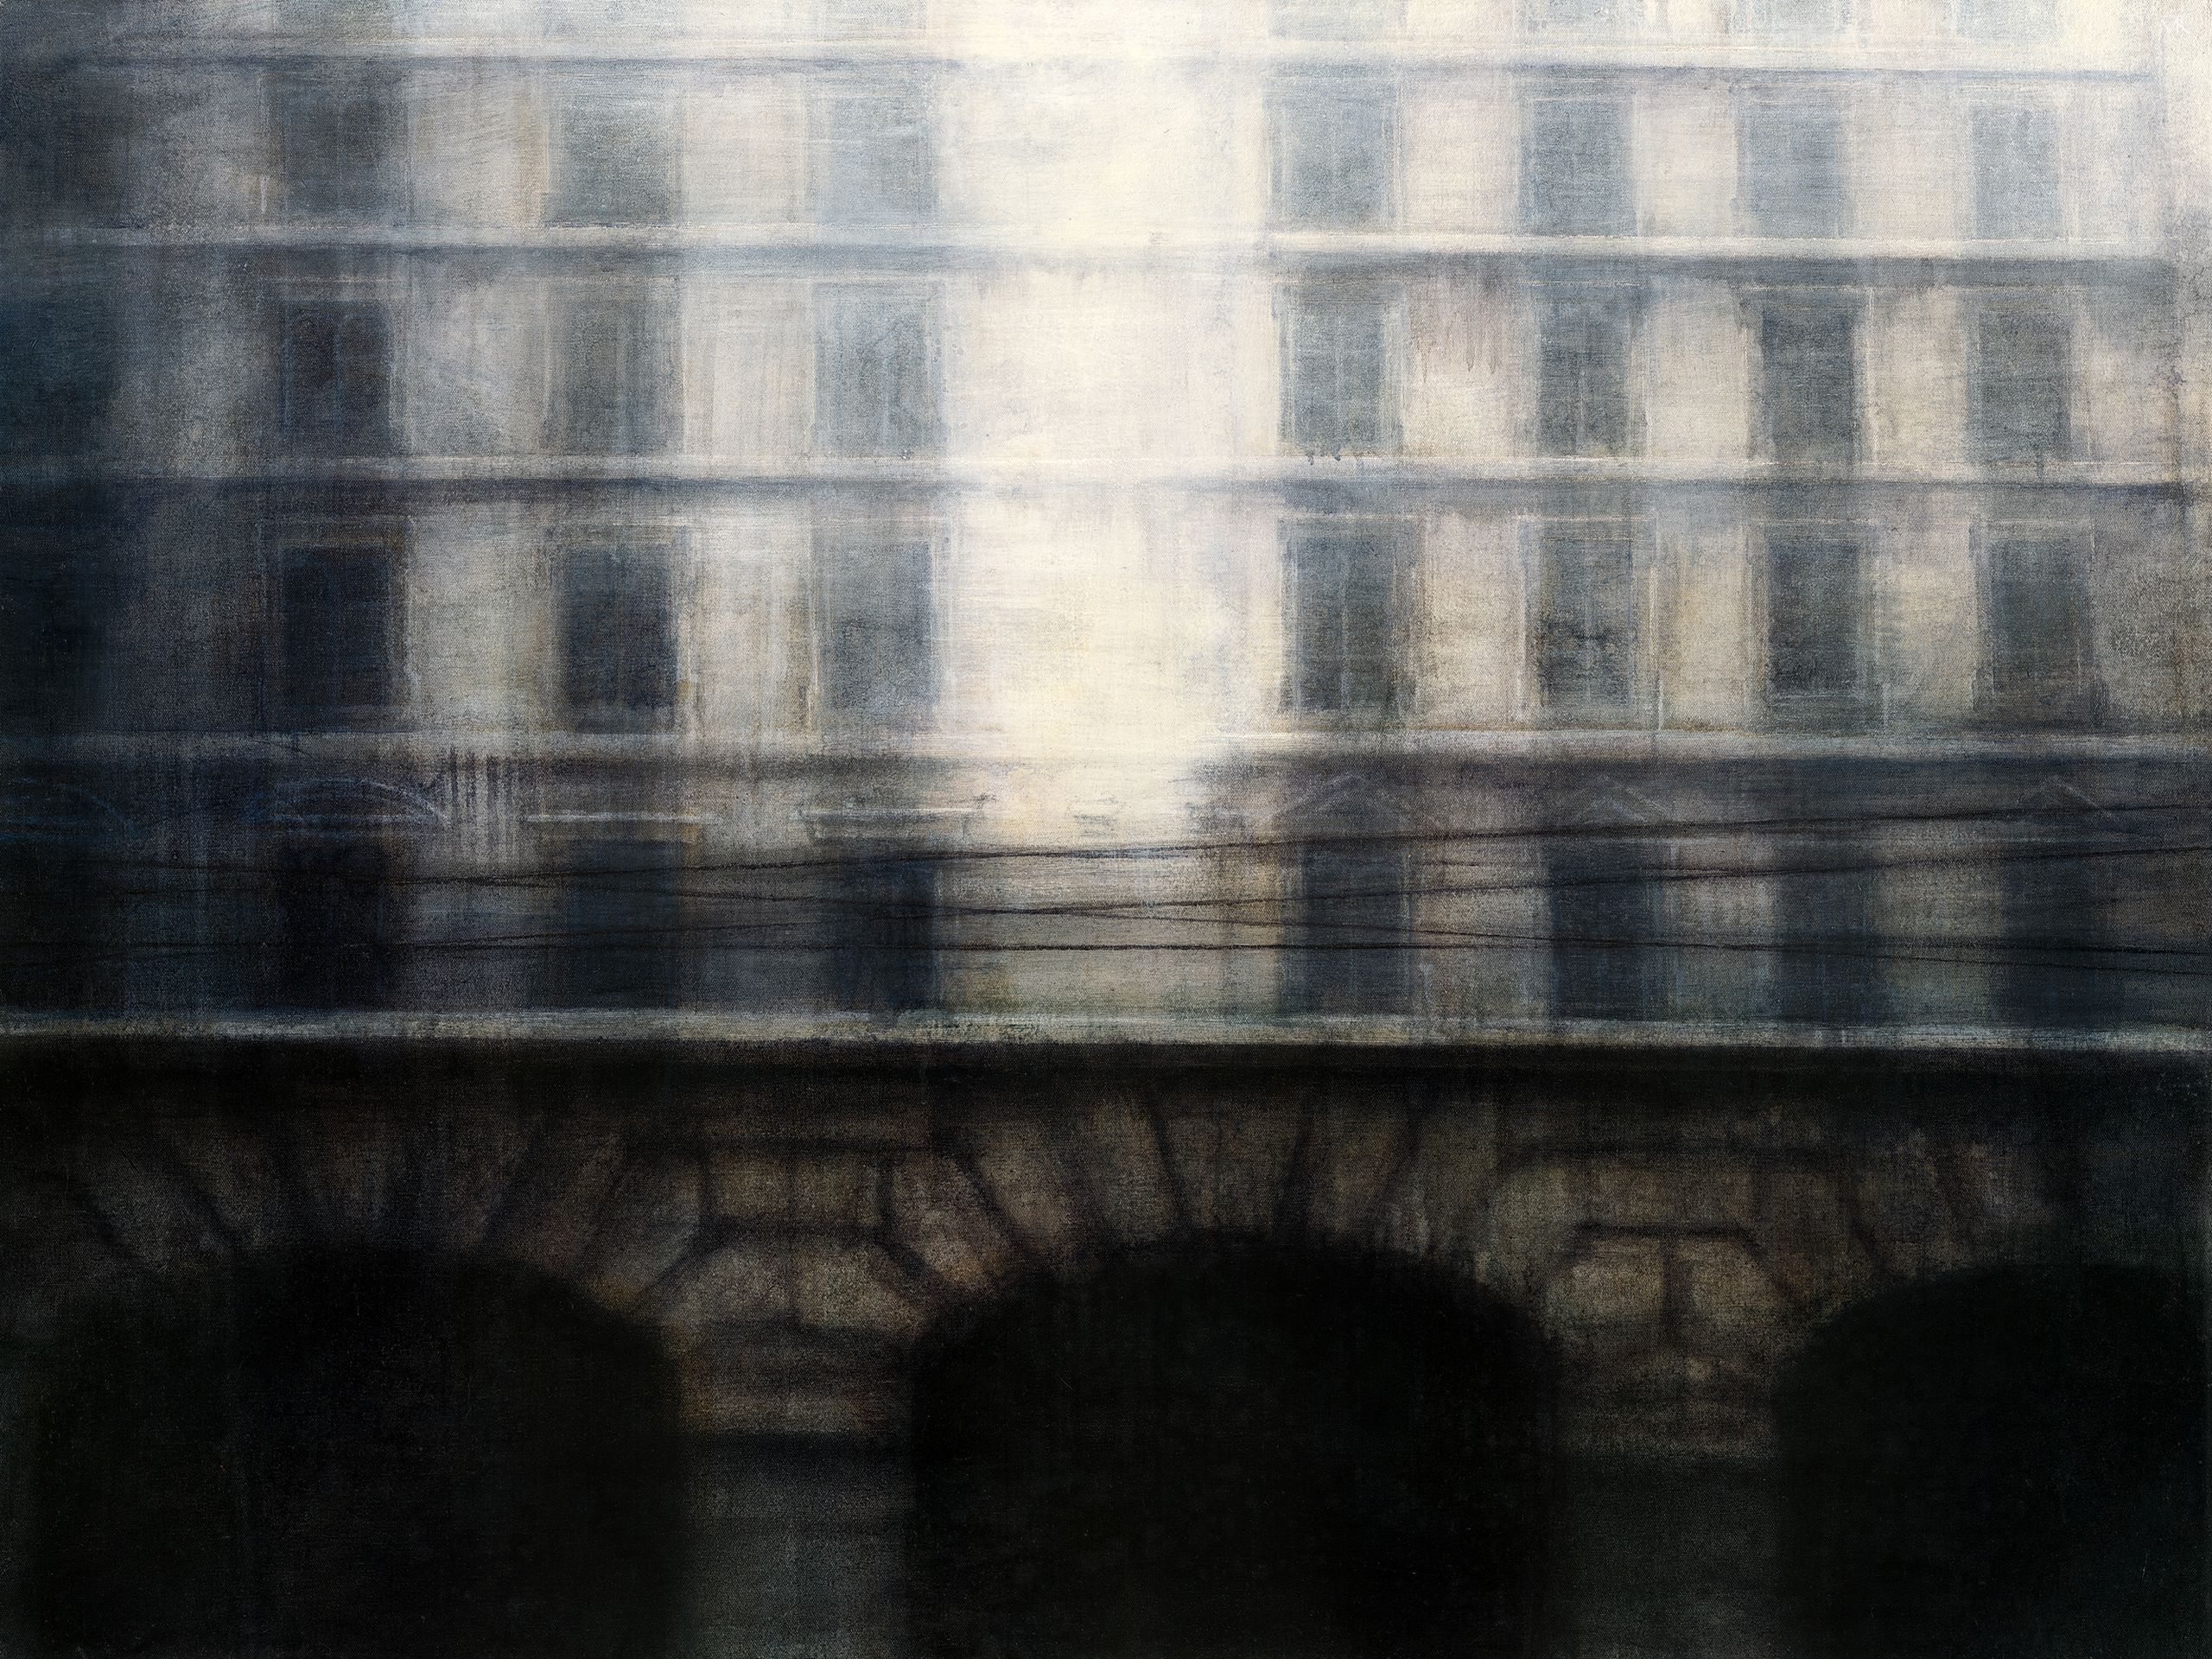 "Maya Kulenovic: TRADUCTIO, 2012, oil on canvas, 36"" x 48"" (91.5cm x 122cm). 'Build' (Architectural, Cityscape)"